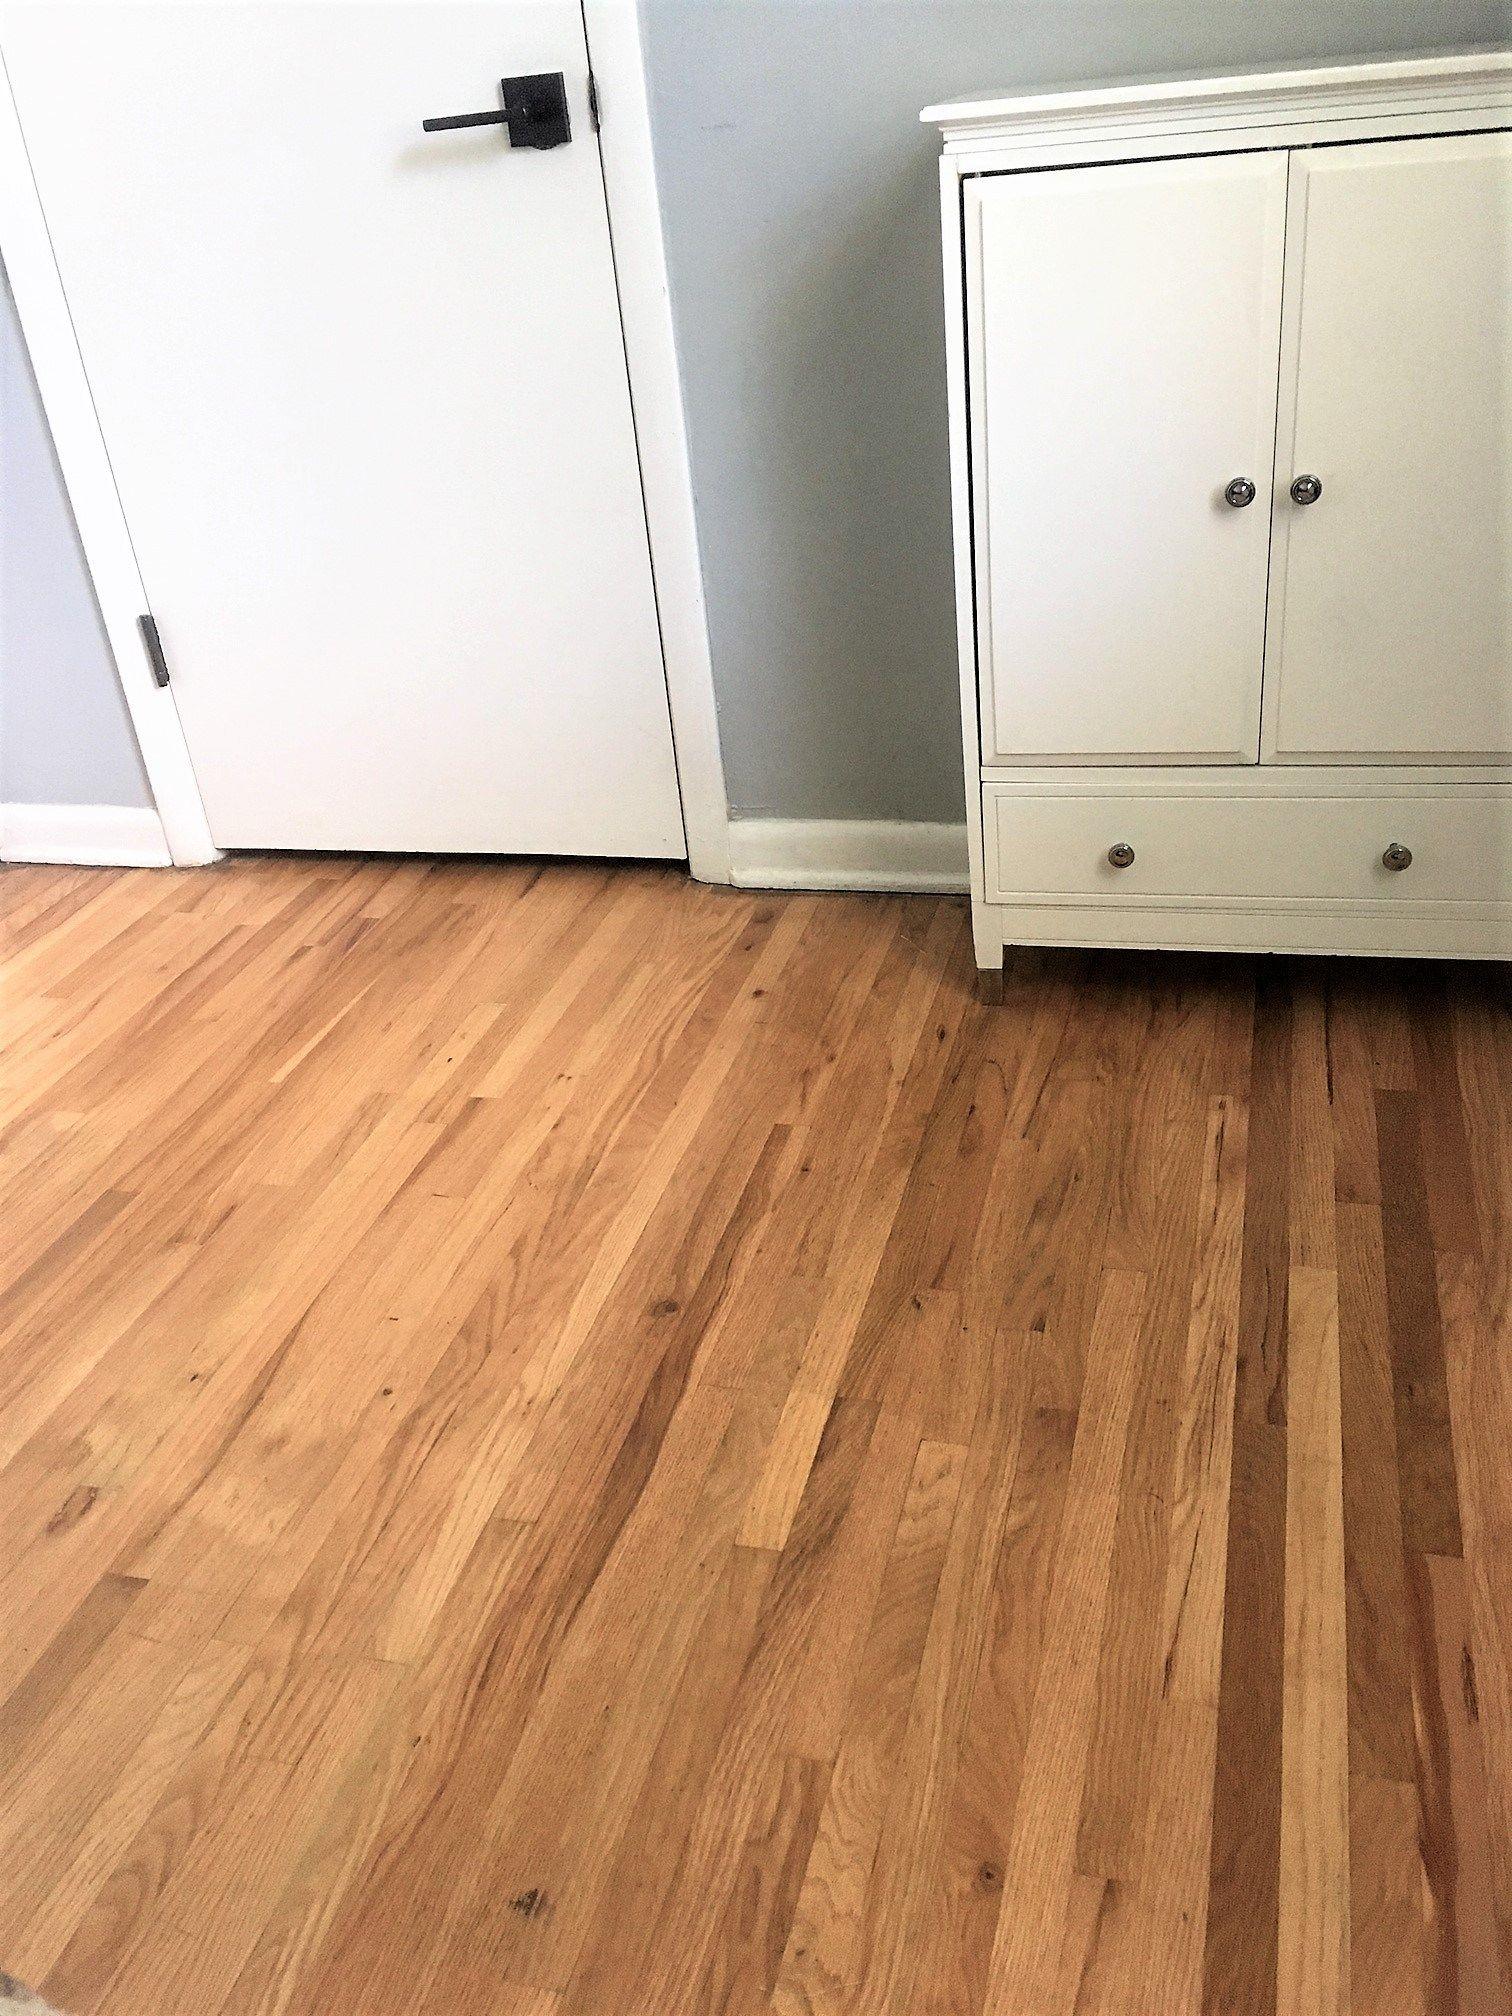 3 Years Later Diy Hardwood Floor Refinish Ideas For The House